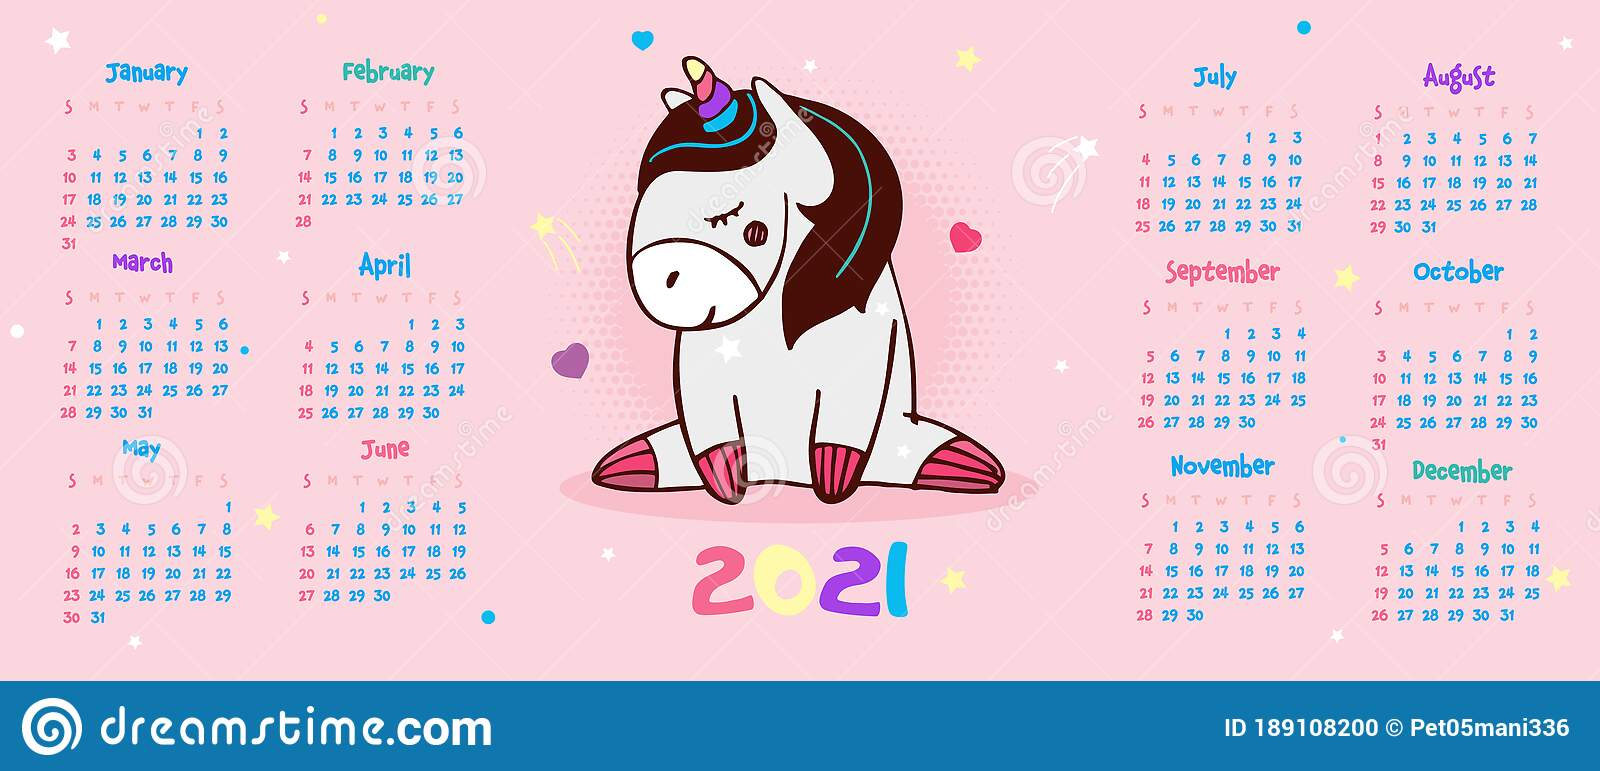 Unicorn Calendar 2022.Calendar 2021 Cute Unicorn With Closed Eyes Dreams On A Pink Background Vector Stock Vector Illustration Of Element Calendar 189108200